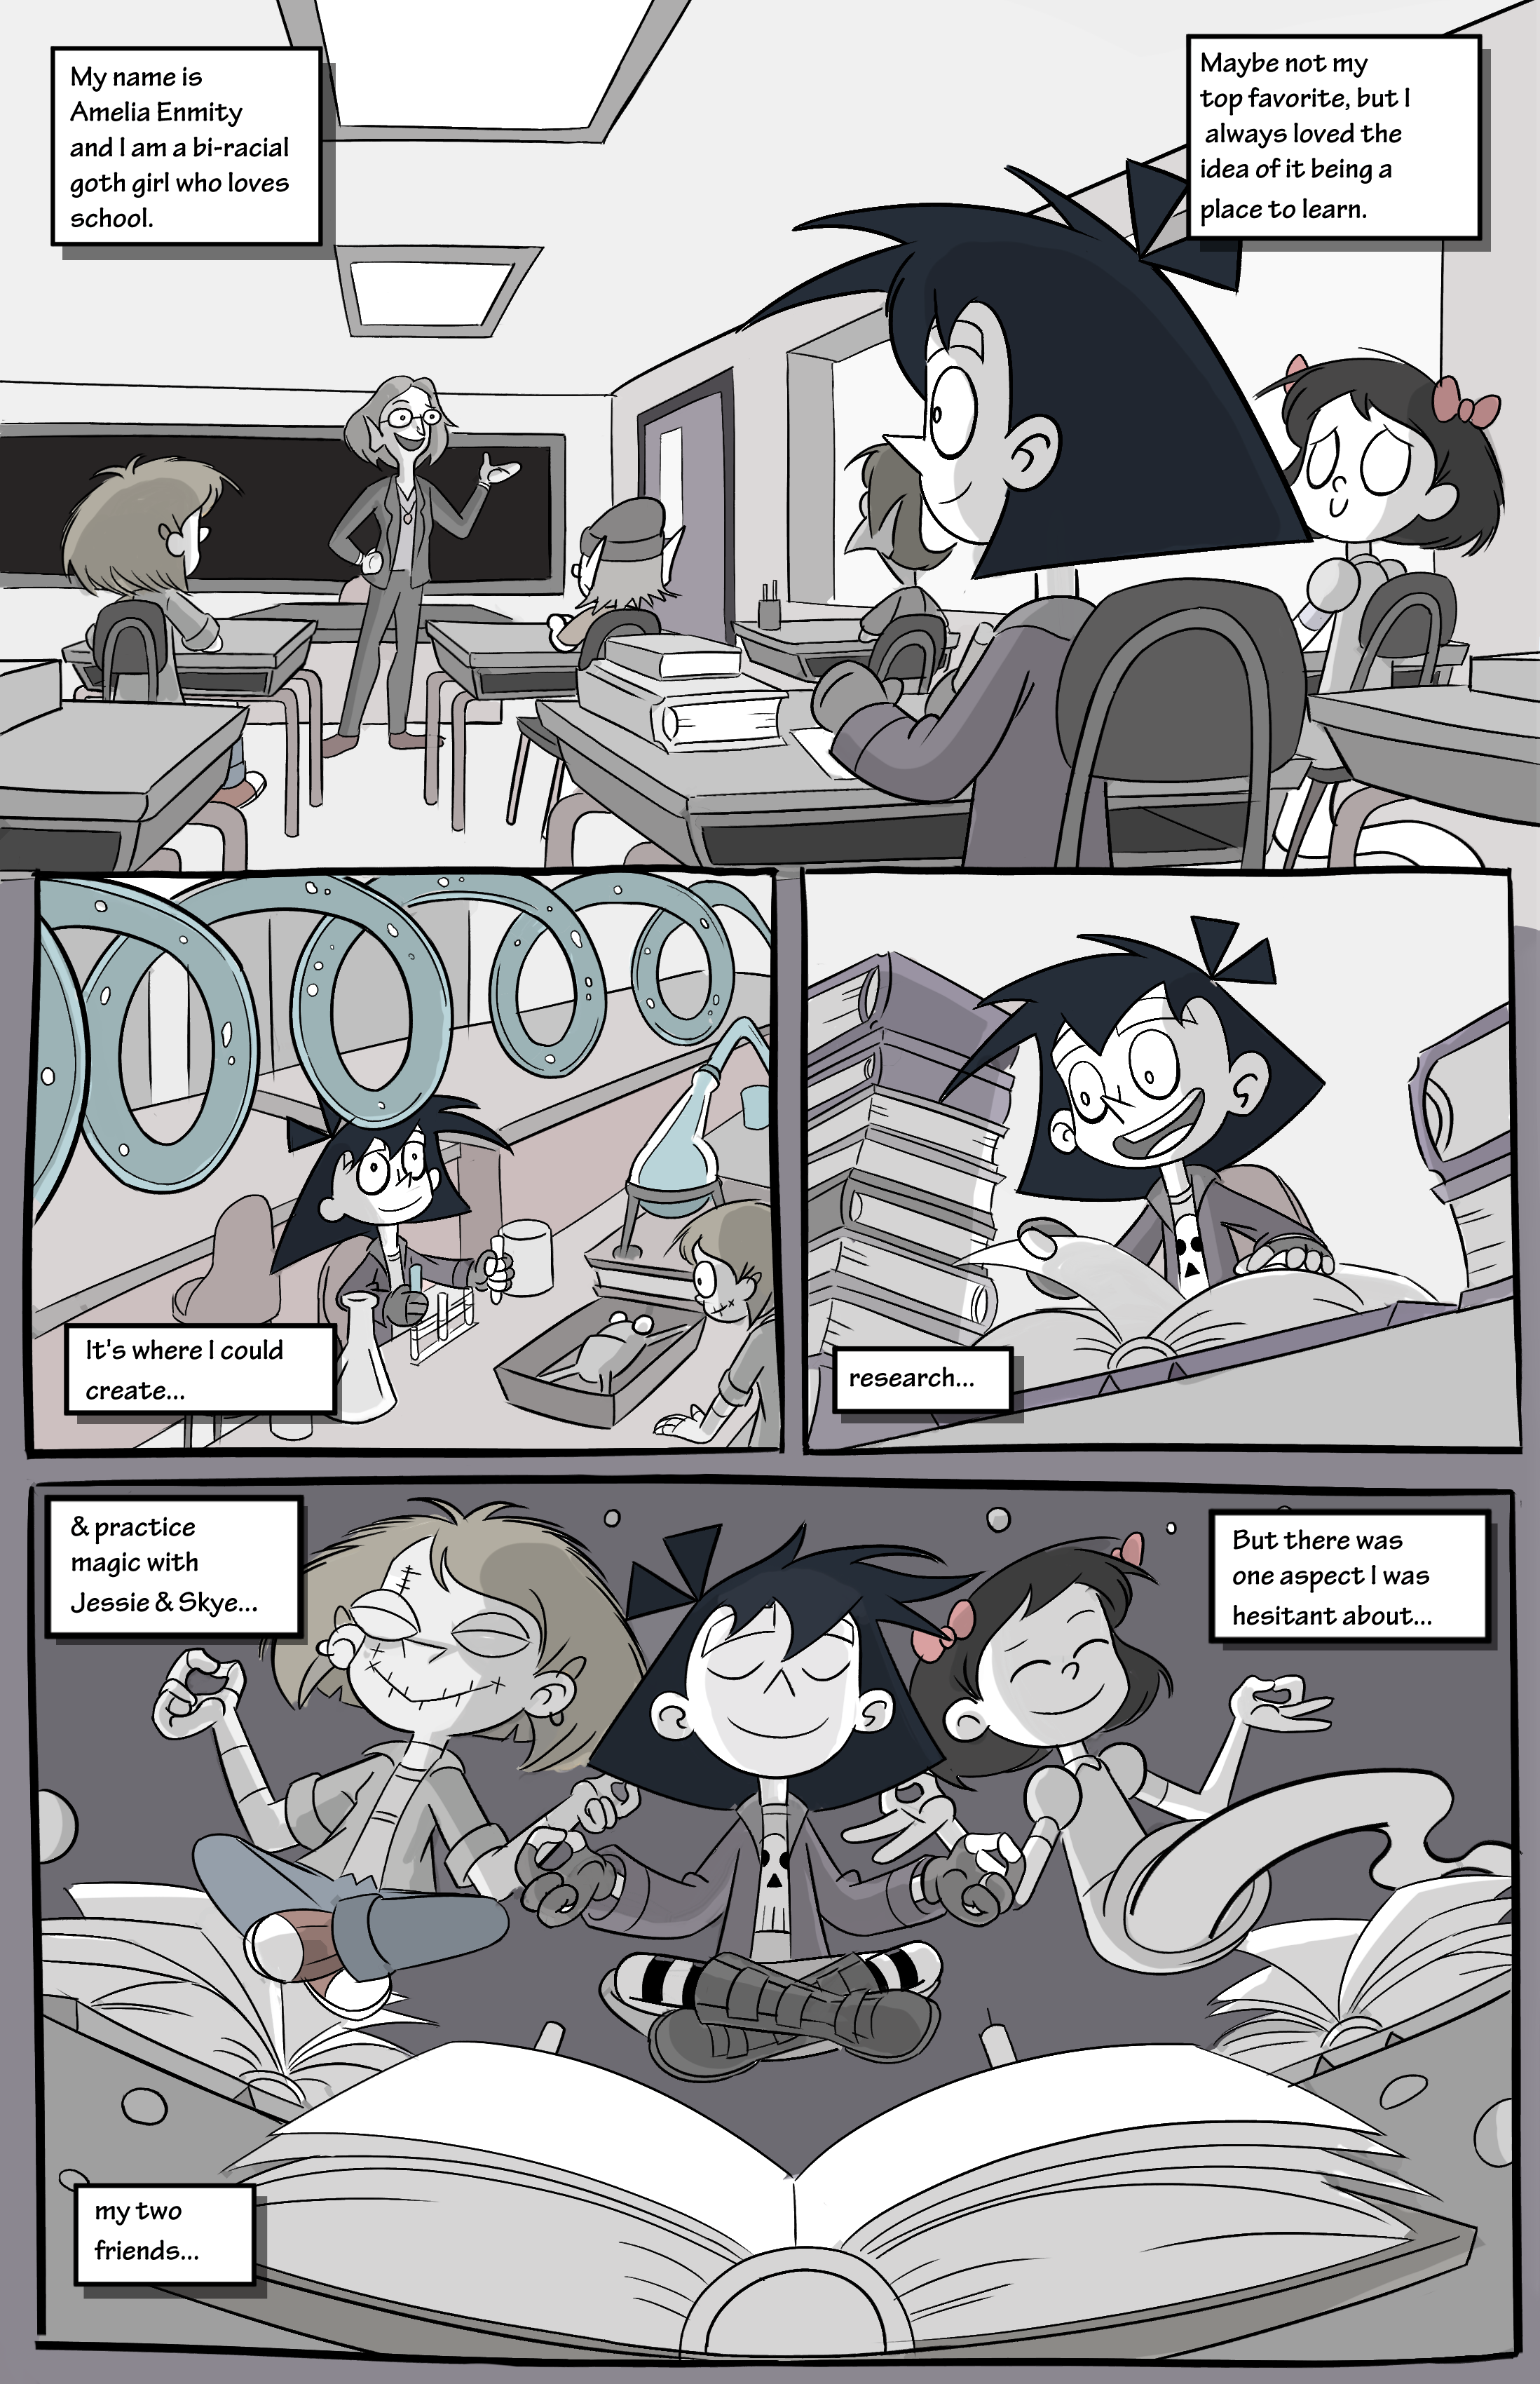 Amelia Enmity #1 (page 1)